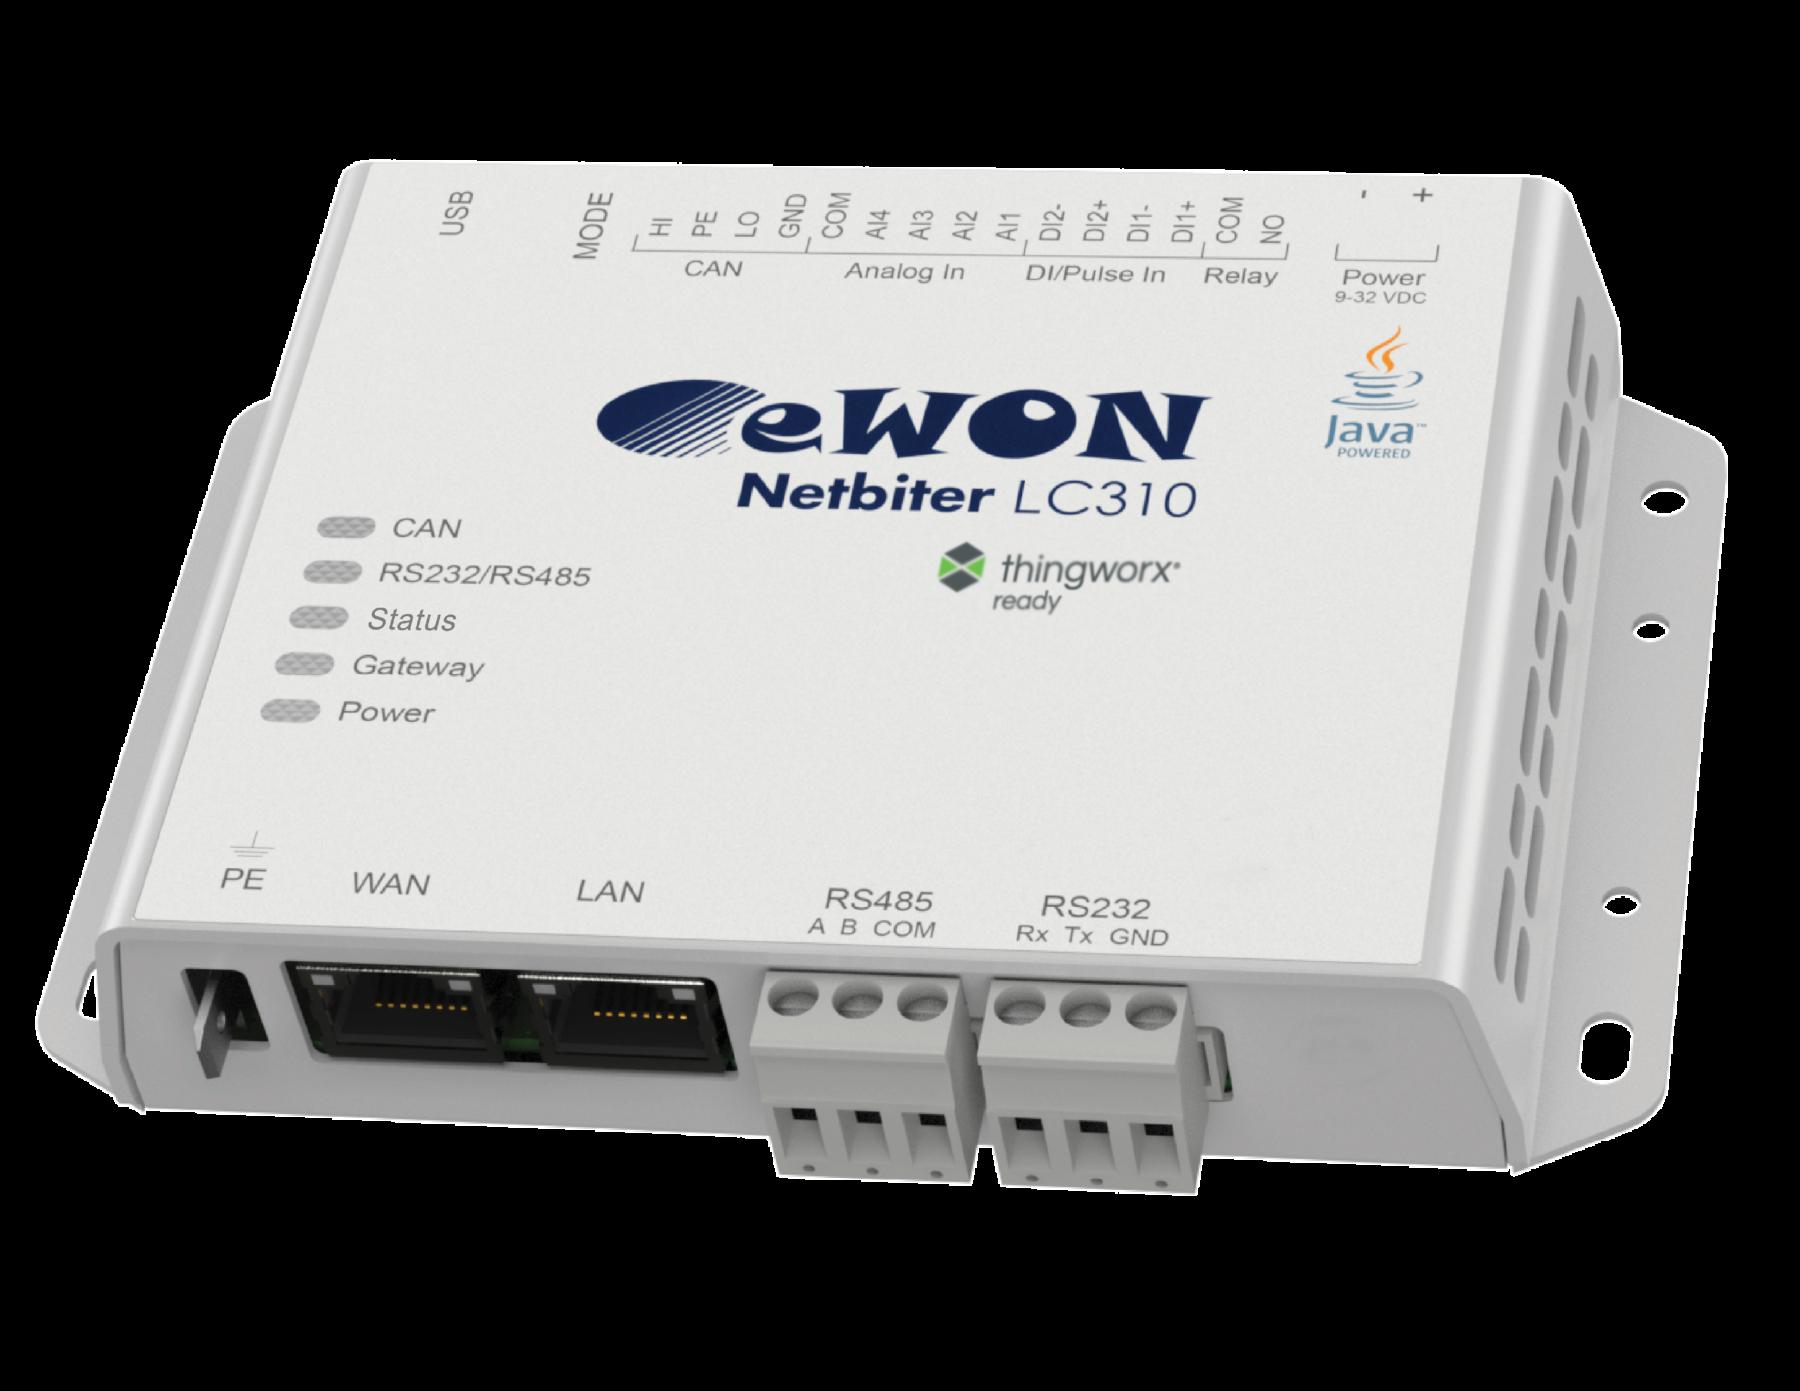 eWON Netbiter LC310